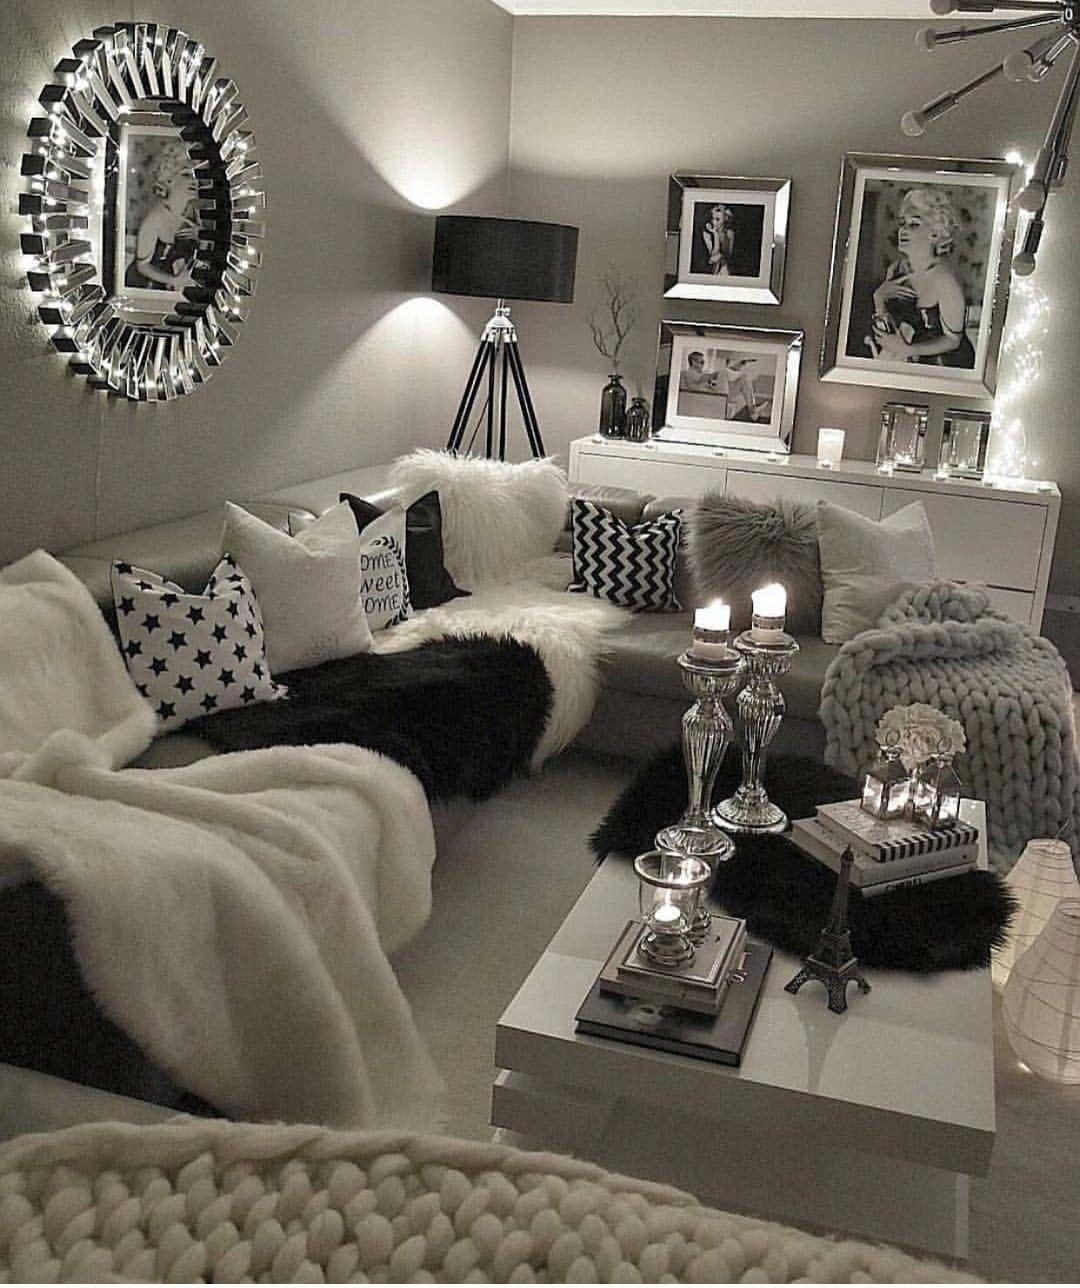 Leabeautyyx Living Room Glam Black White Light Chic Gorgeous Beautiful Homedecorliv Romantic Living Room Farm House Living Room Glam Living Room